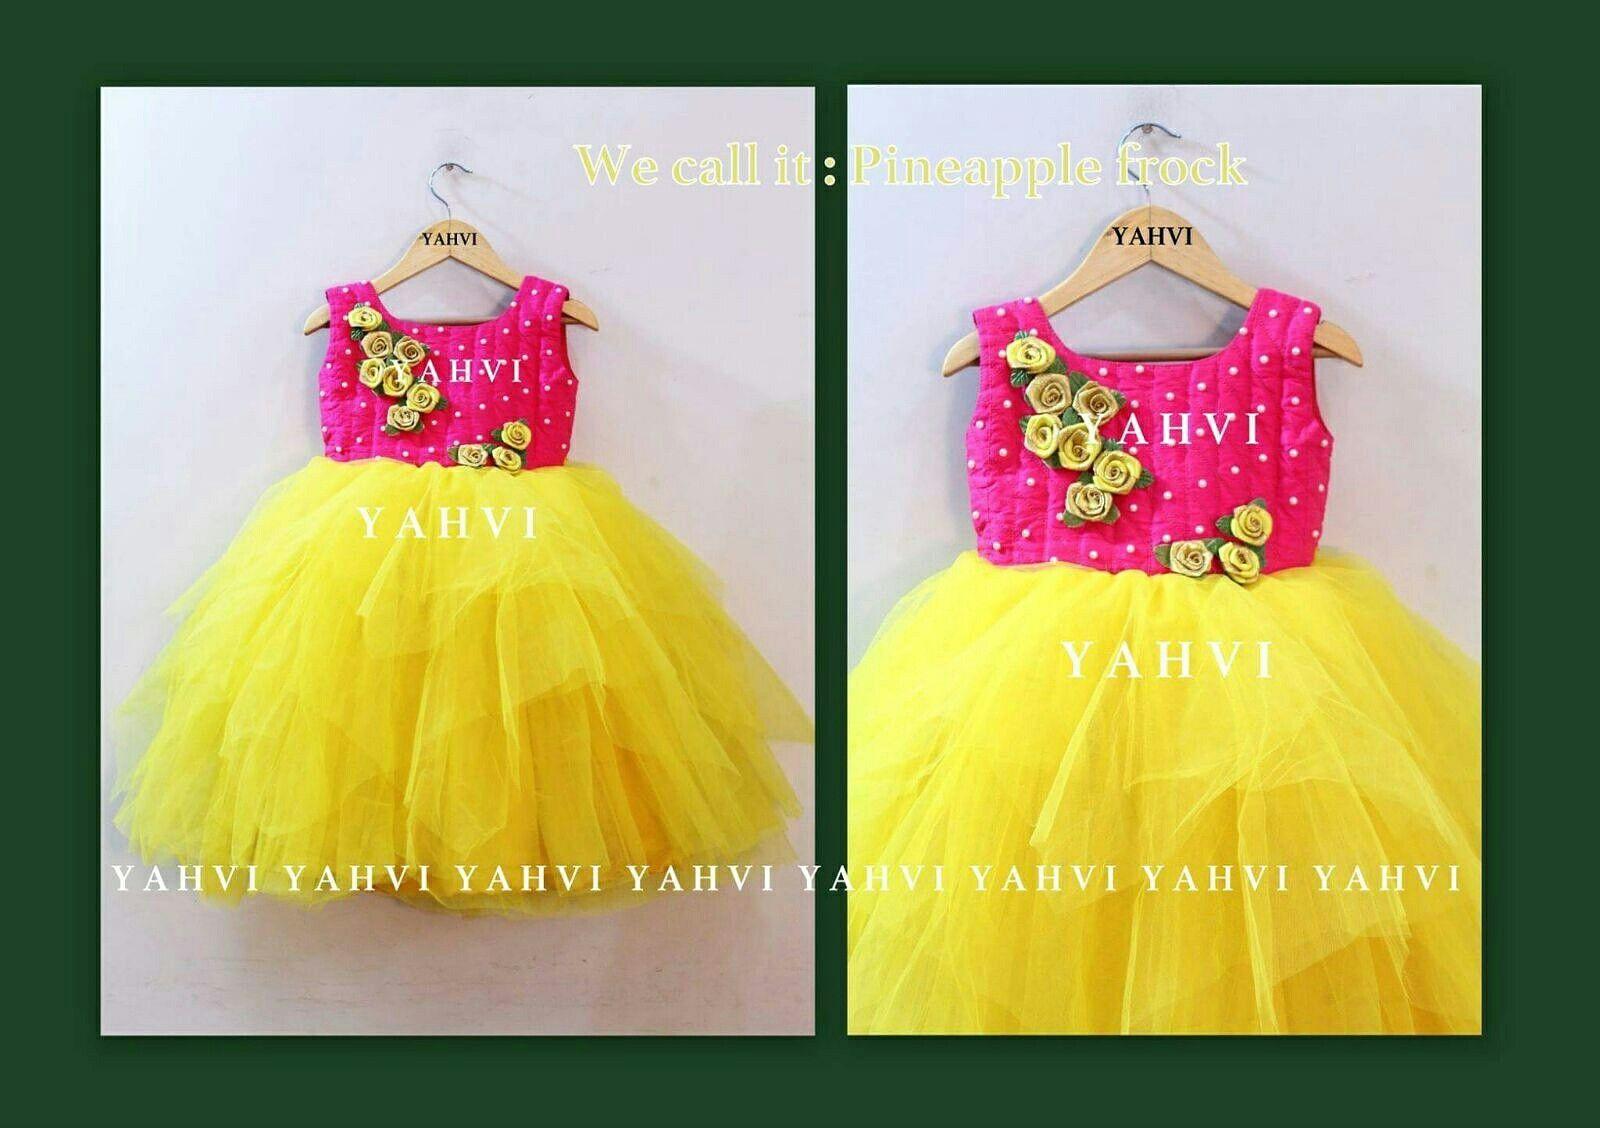 Yahvi luxury designer kids wear kashvi birthday dress